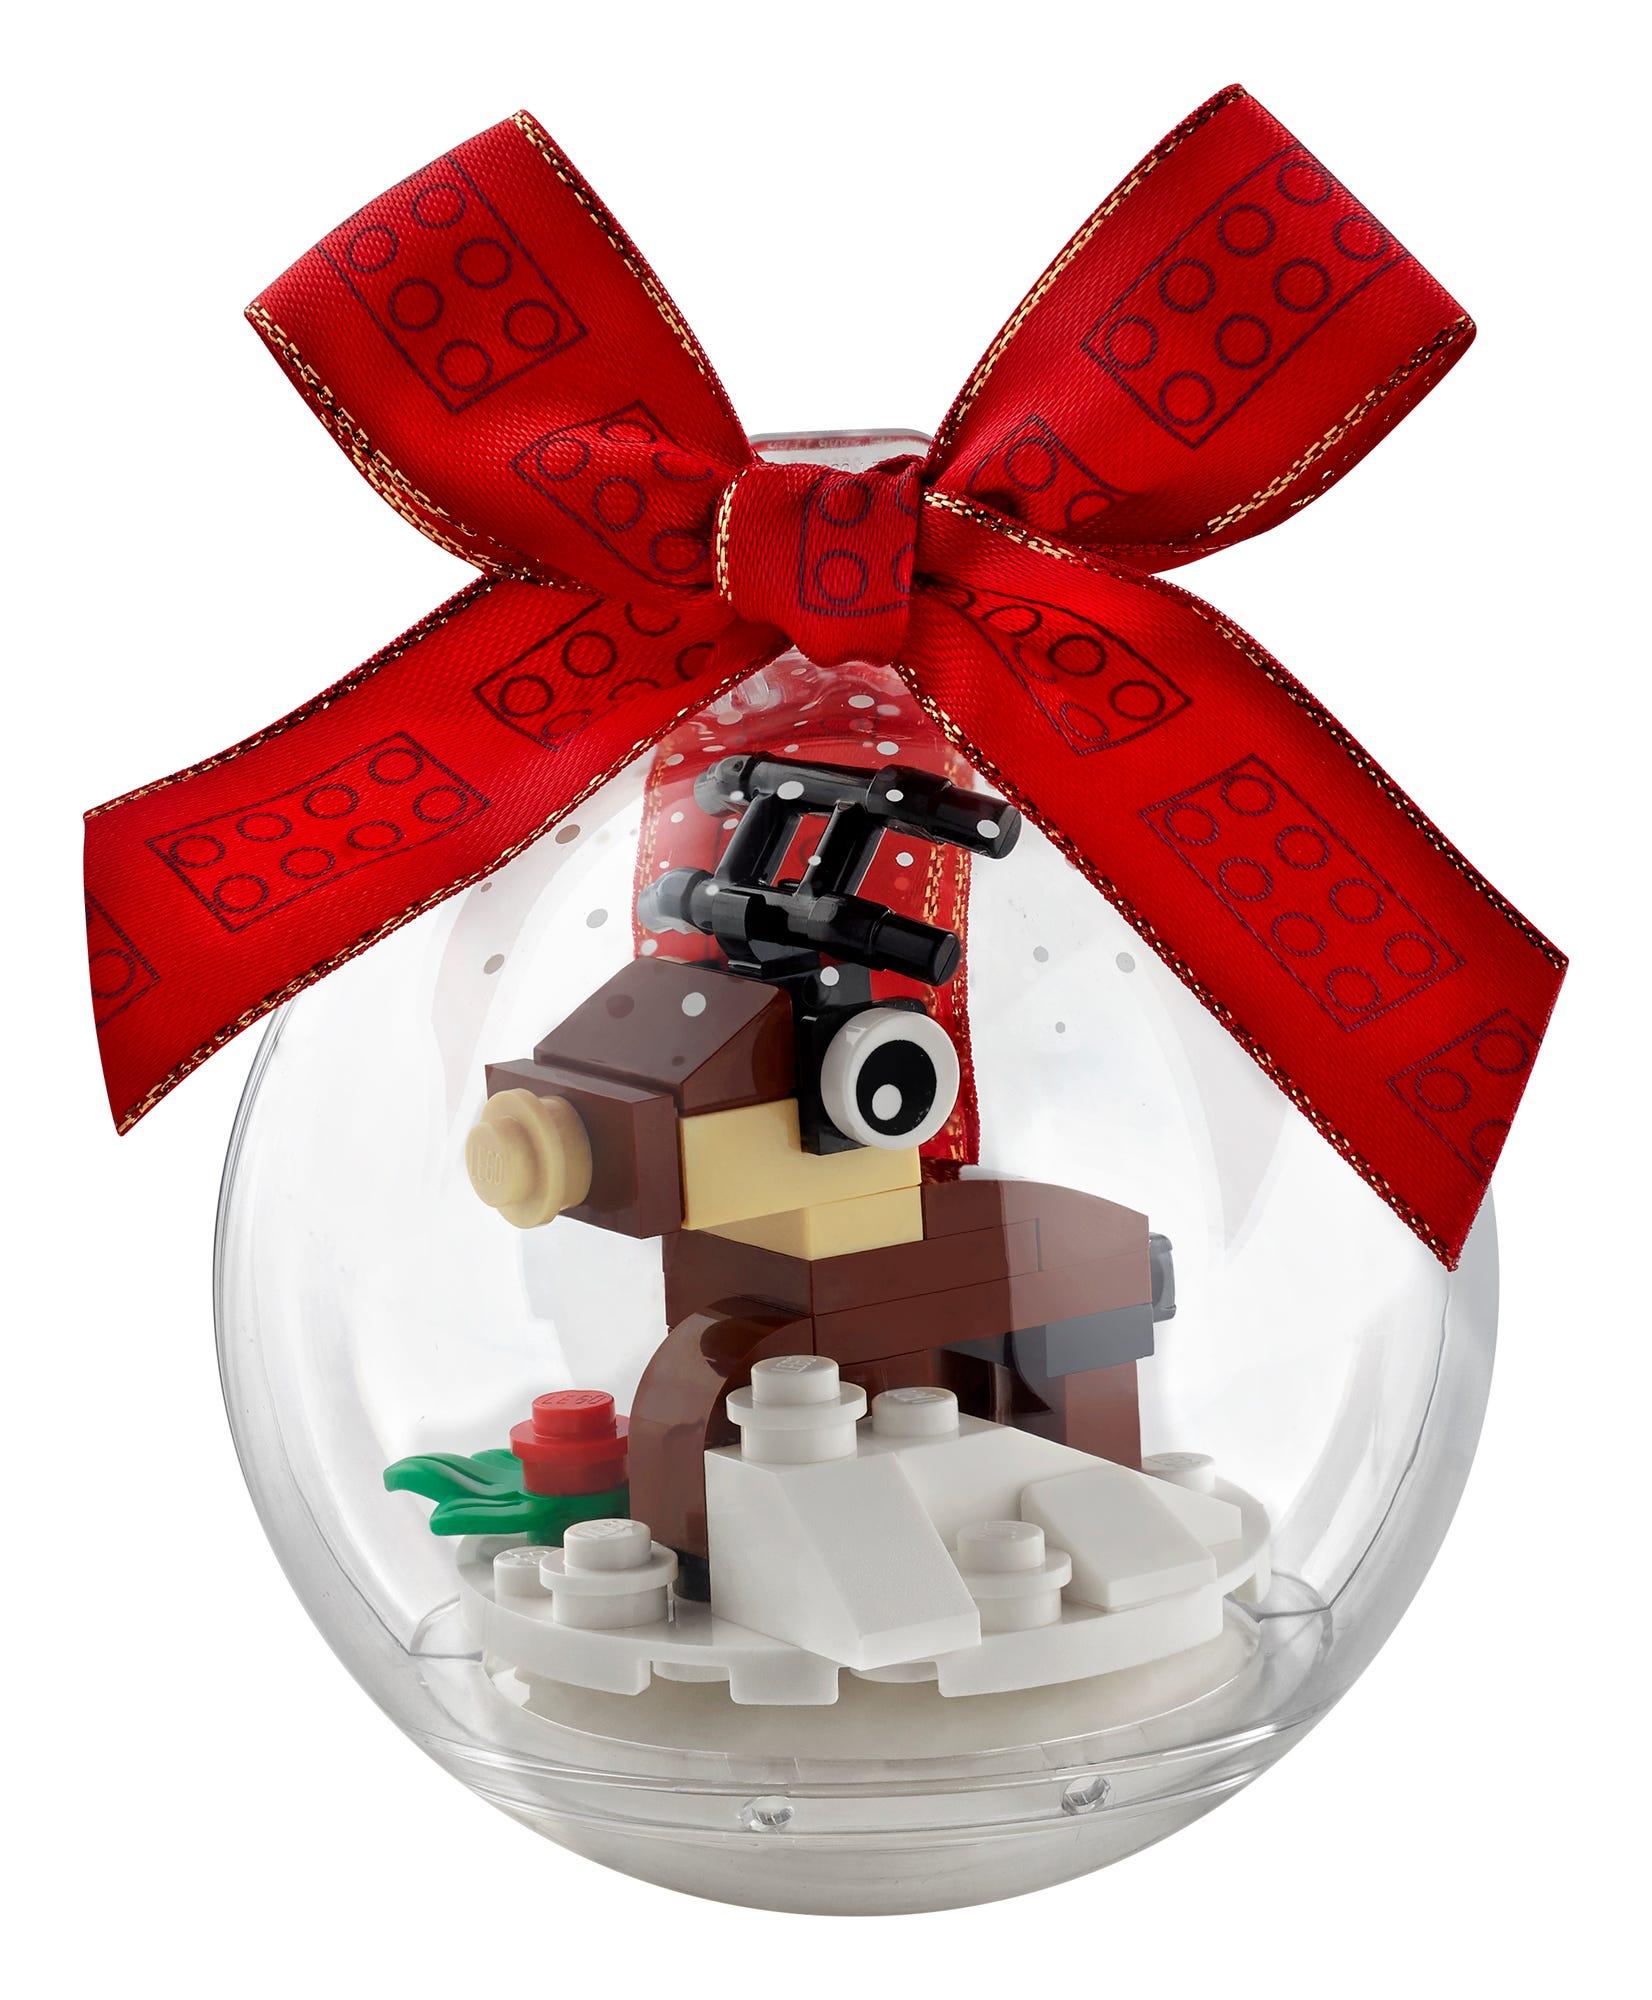 LEGO 854038 Rentier Ornament (1)